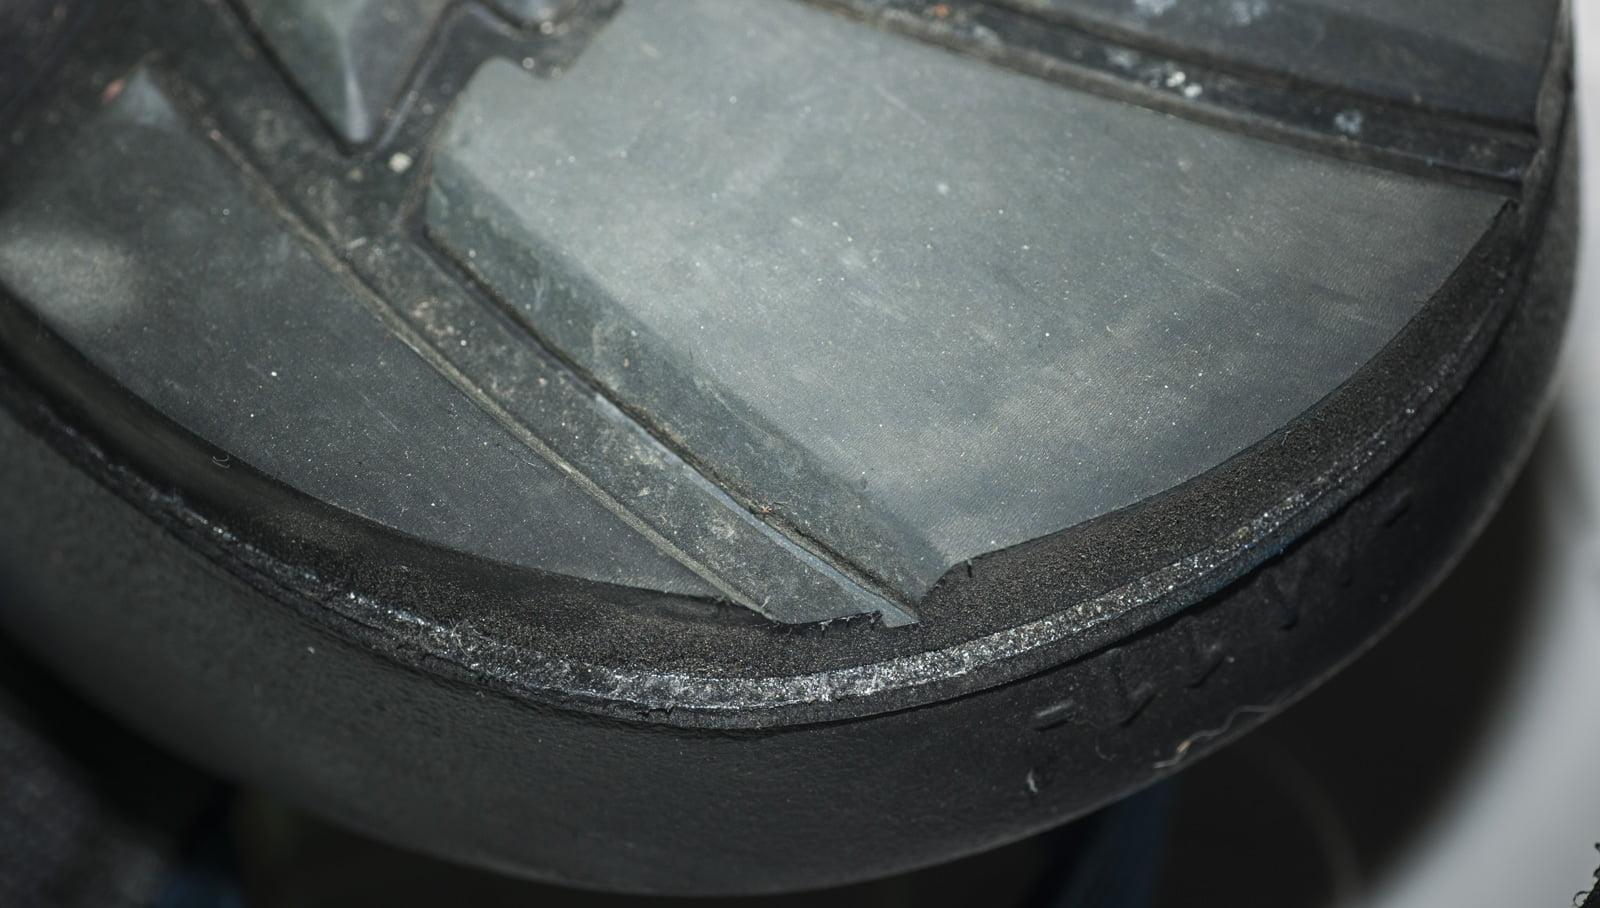 Chaco-Athletic-Sport-Outdoor-Sandals-Maintenance-專業運動涼鞋-維修-鞋後跟-Vedfolnir